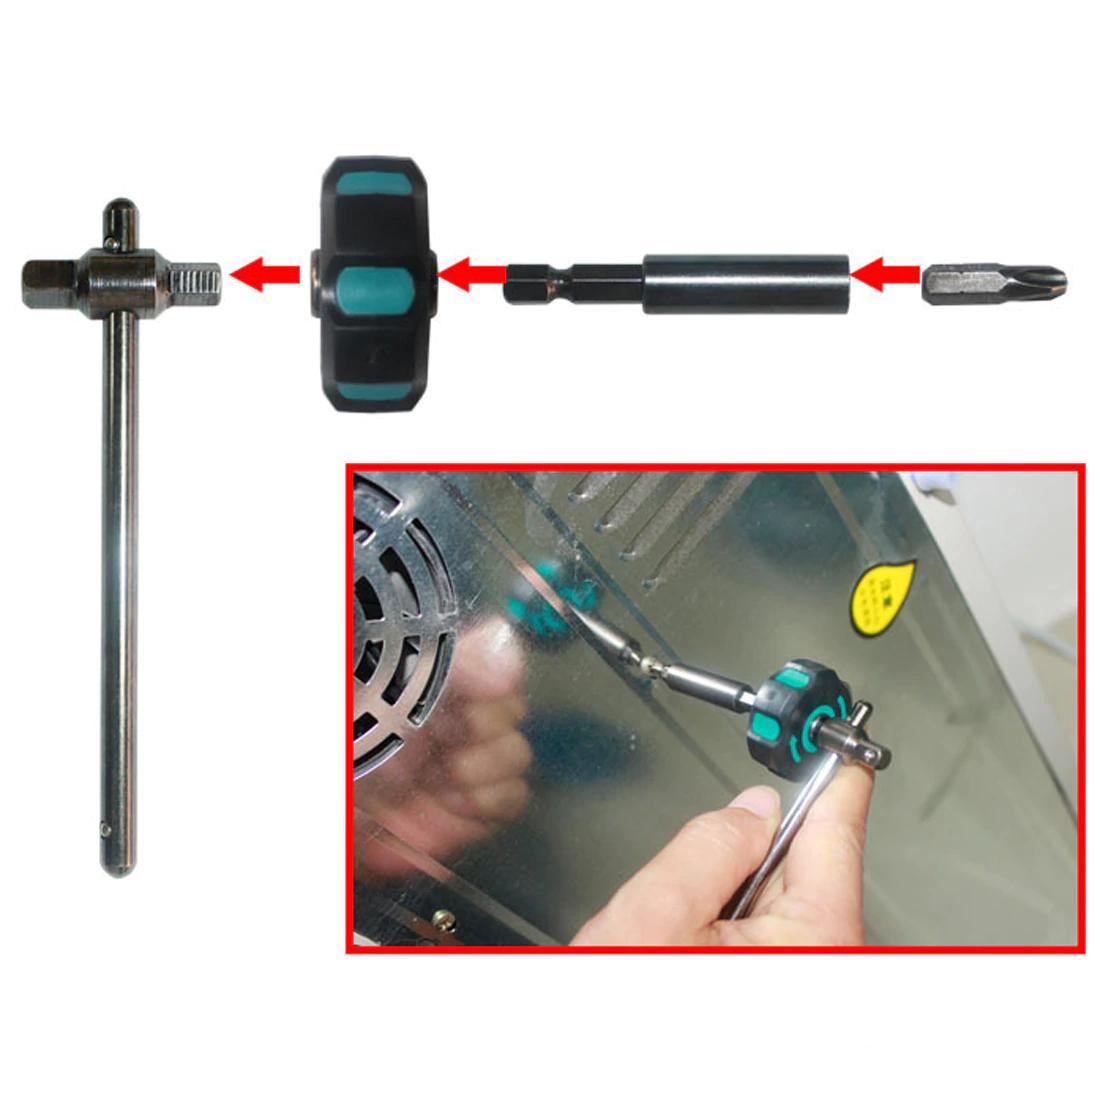 38-In-1-Magnetic-Screwdriver-Kit-2 38 In 1 Magnetic Screwdriver Kit